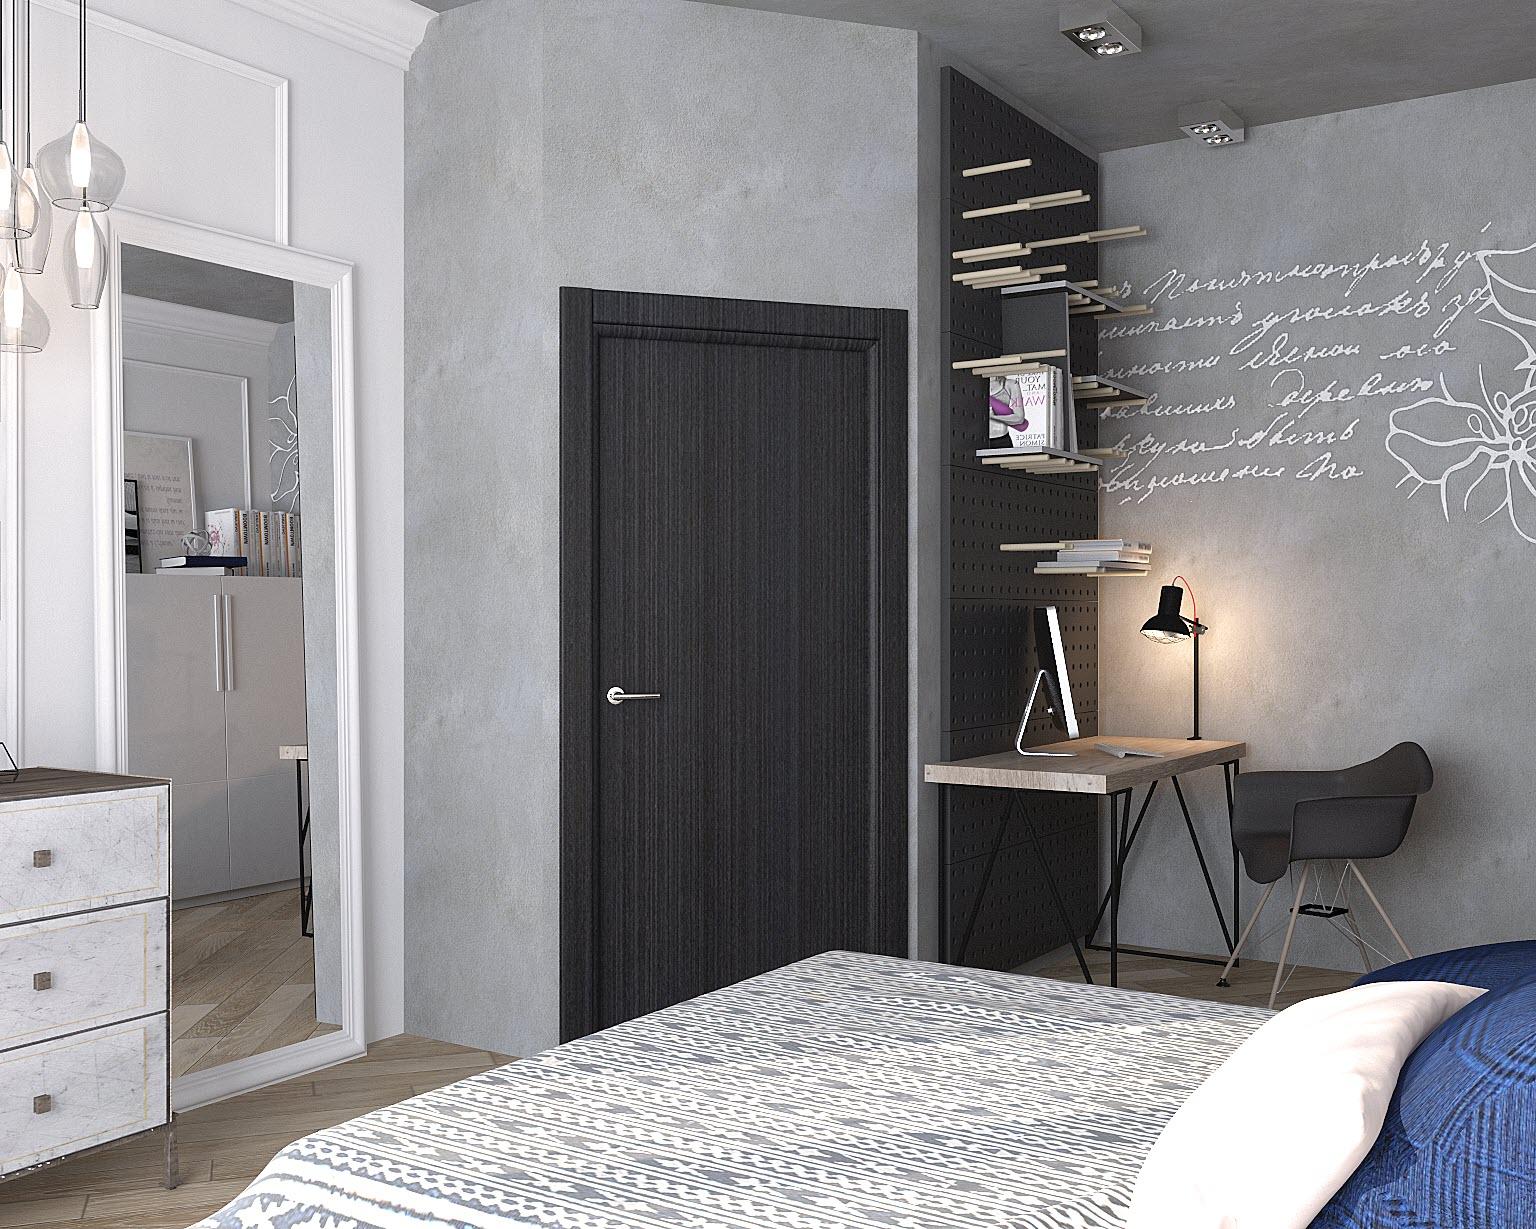 дизайн однокомнатной квартиры 31 кв